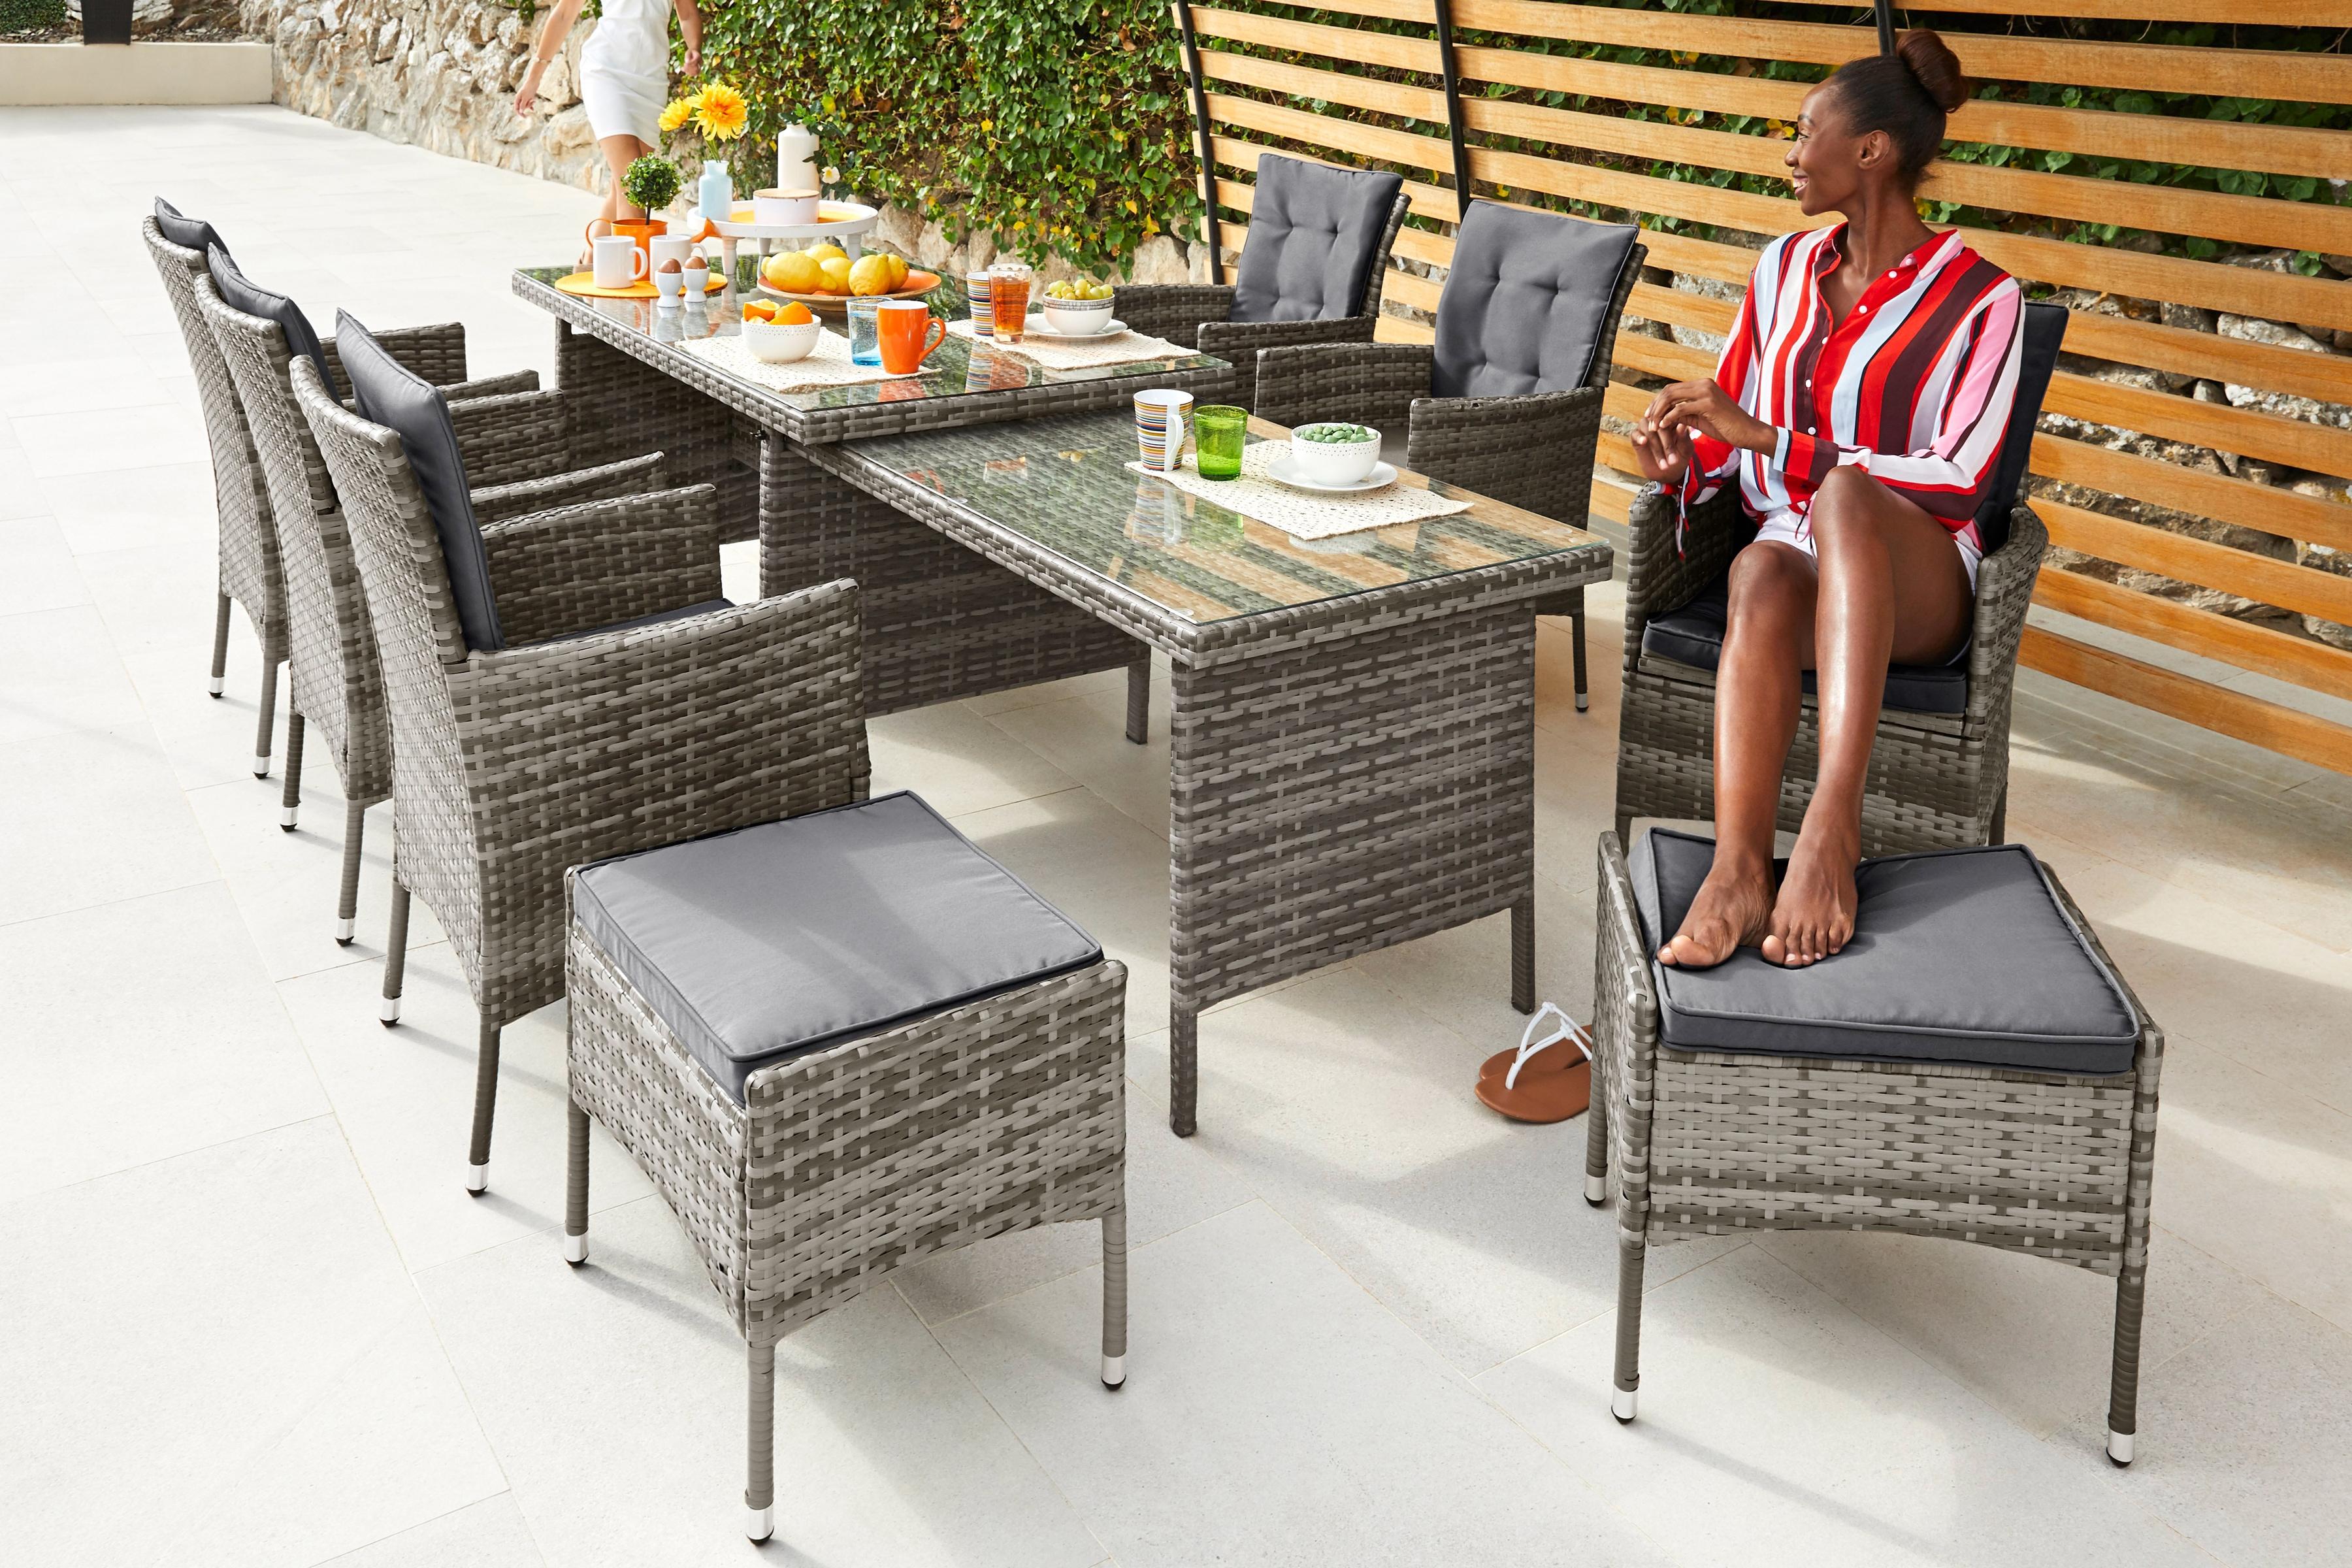 KONIFERA Gartenmöbel-Diningset Lissabon 23-tlg 6 Sessel 2 Hocker Ausziehtisch 795x150-250 cm